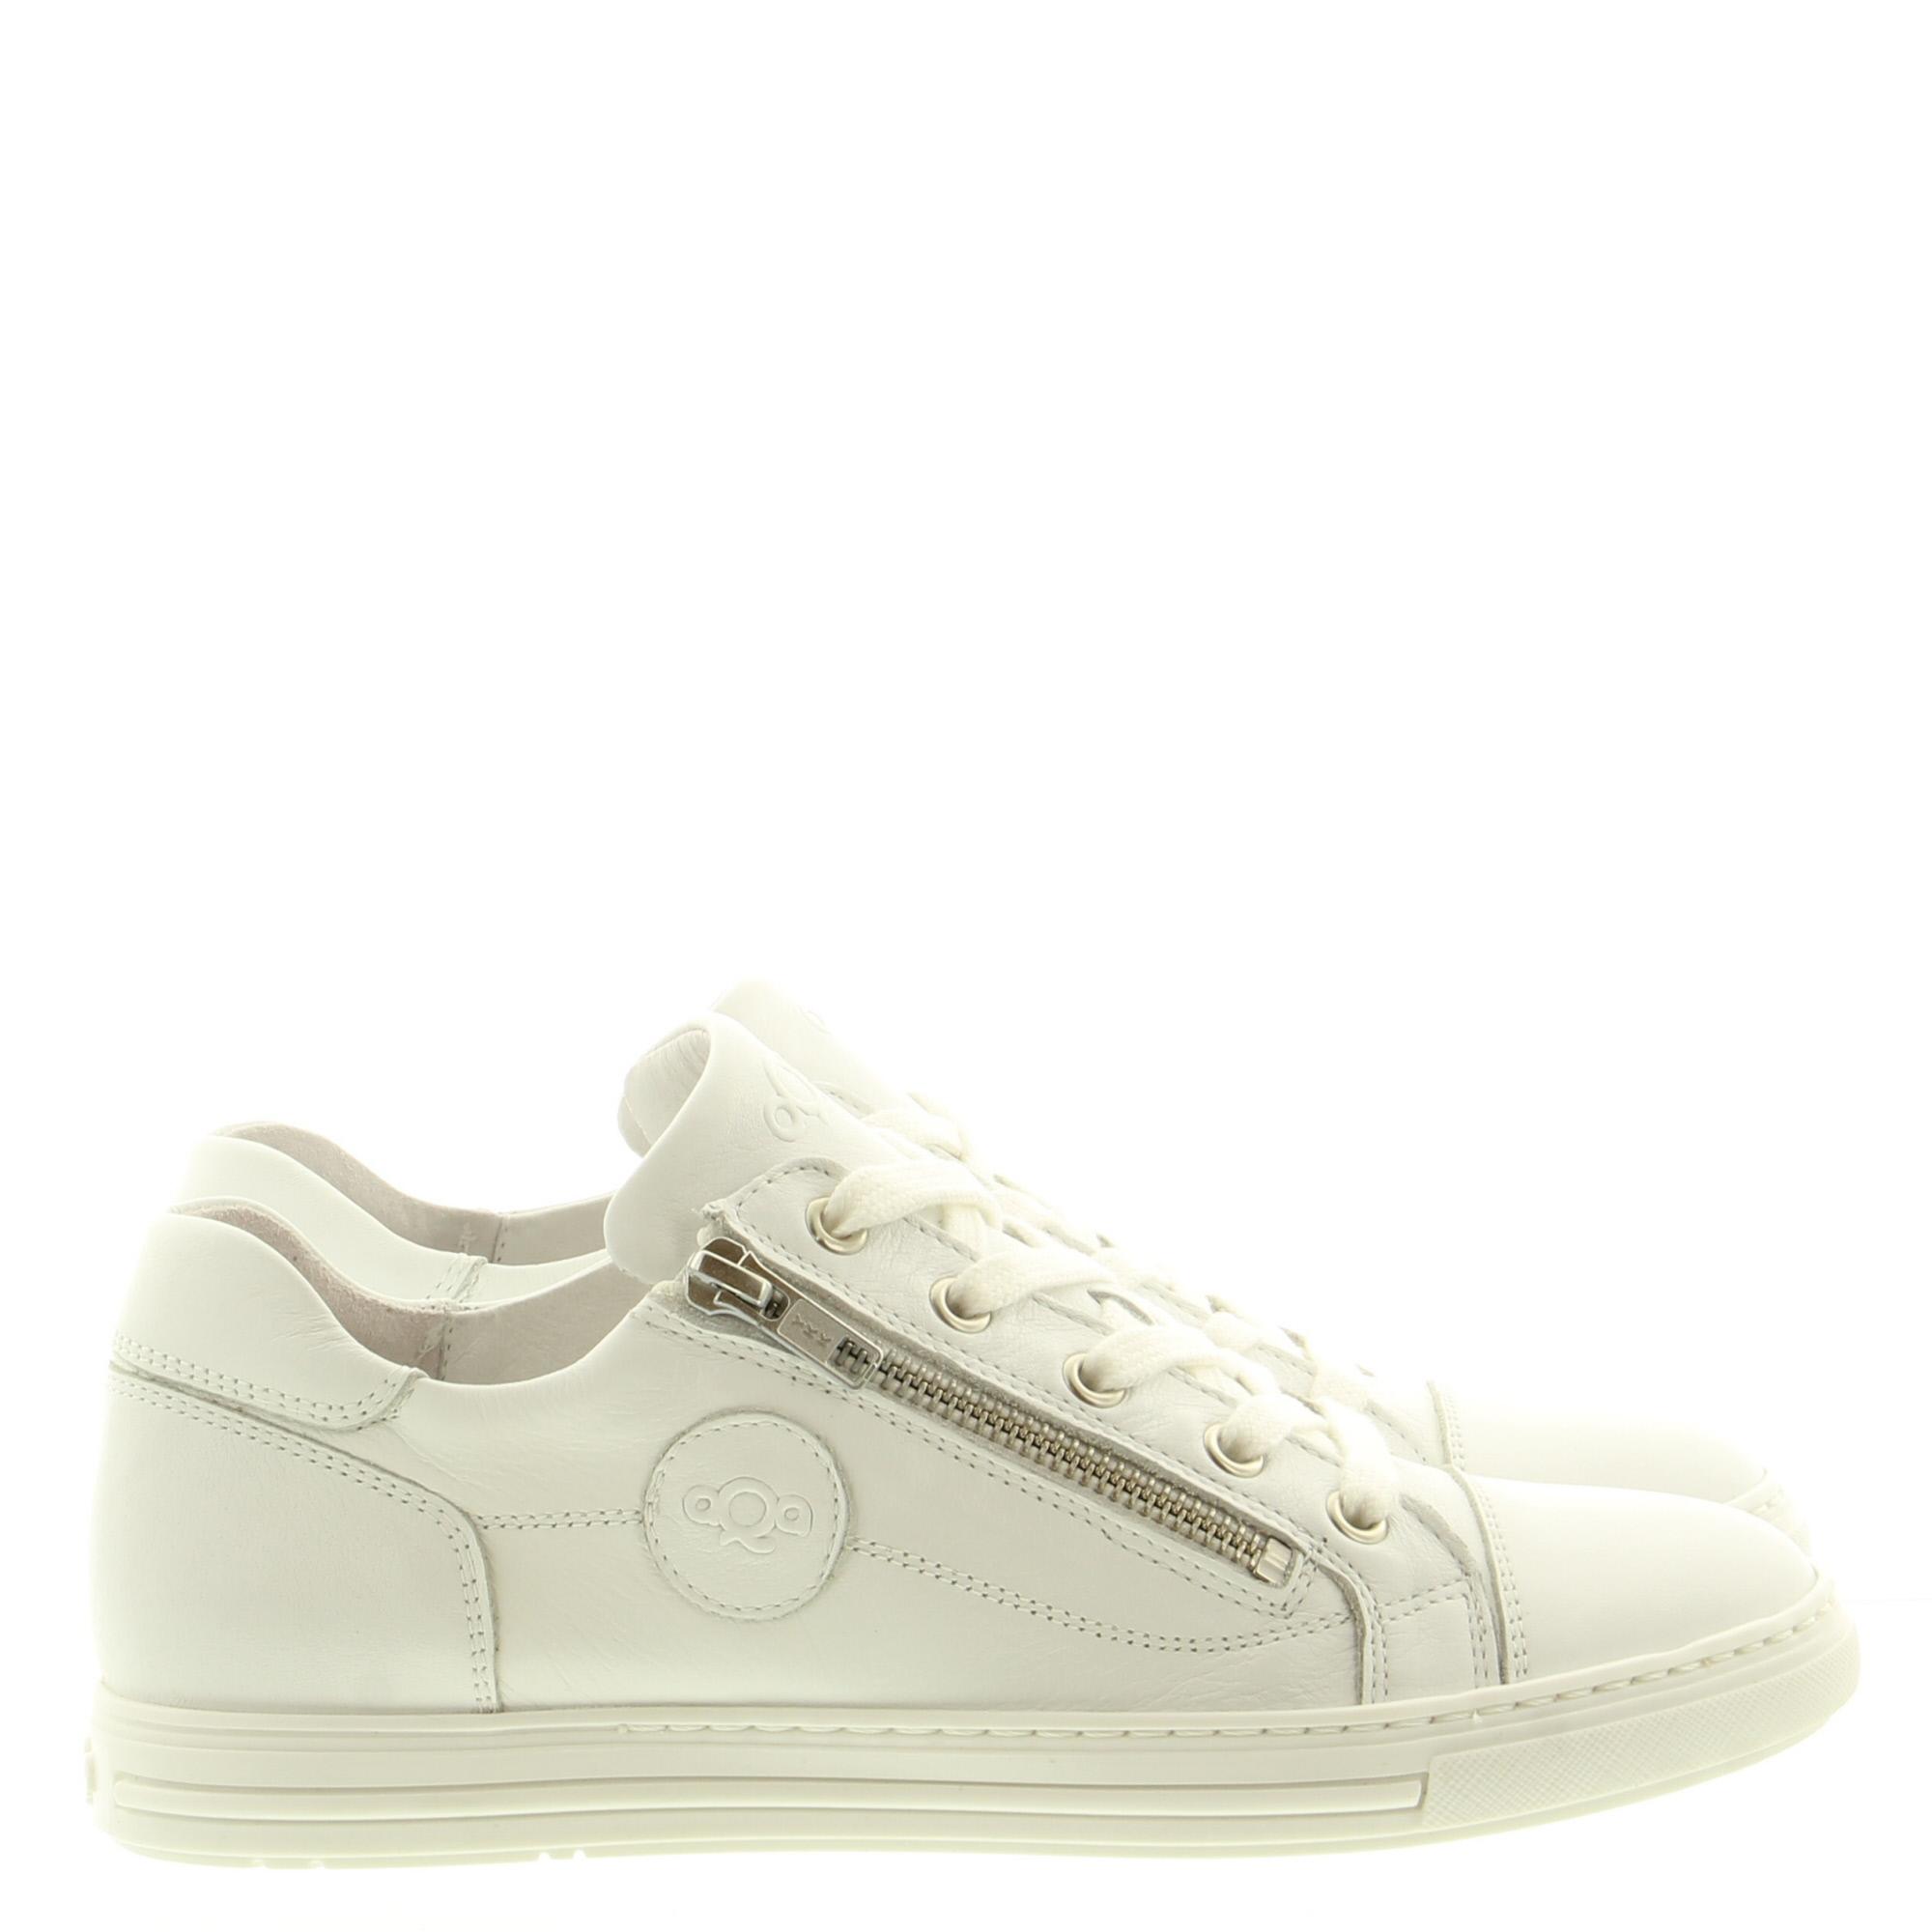 AQA A7655 A11 White